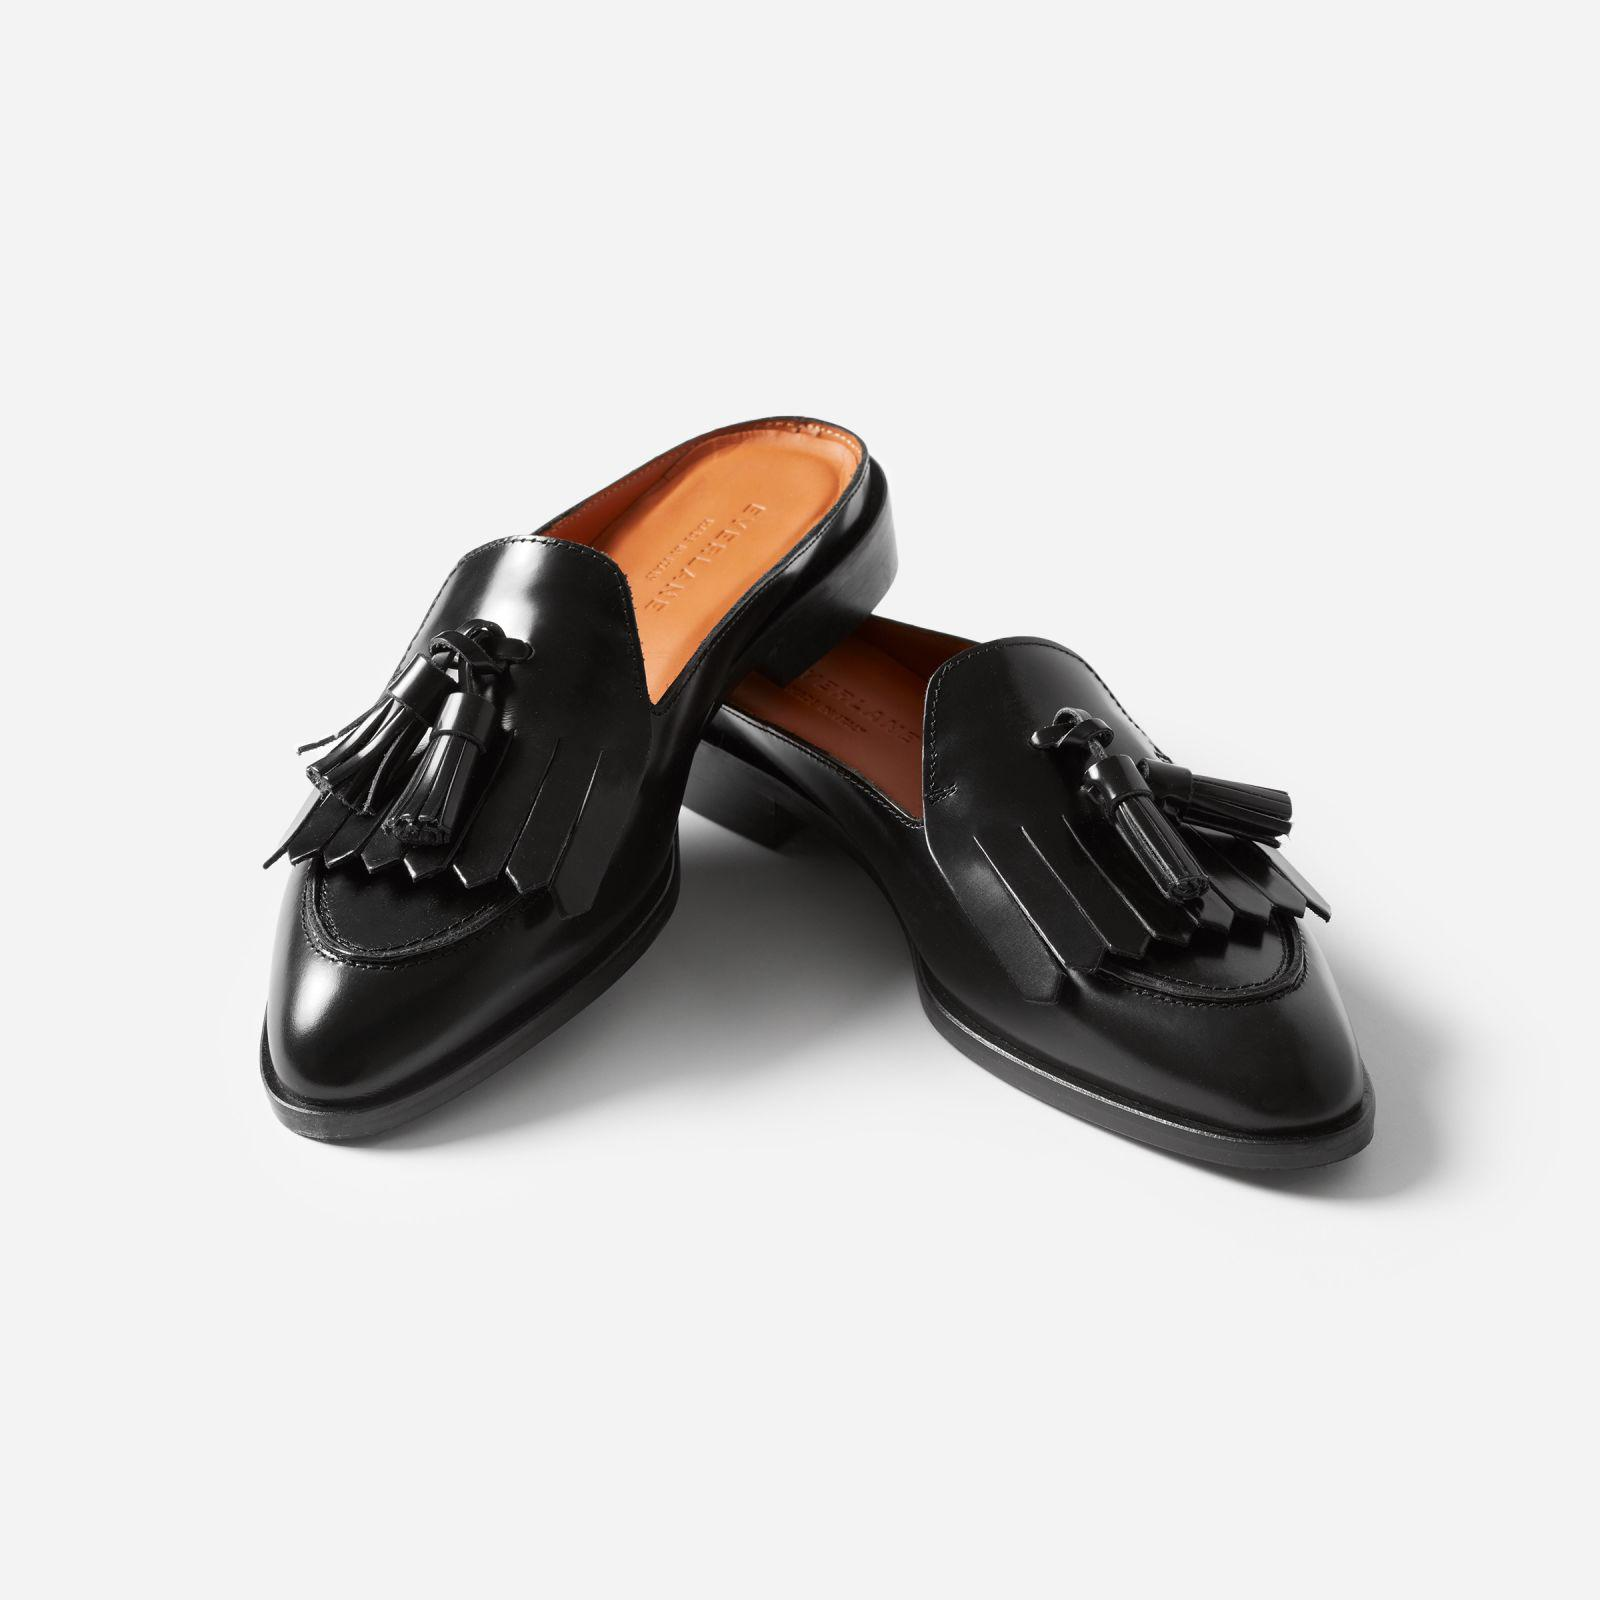 988116b193b Lyst - Everlane The Modern Tassel Loafer Mule in Black